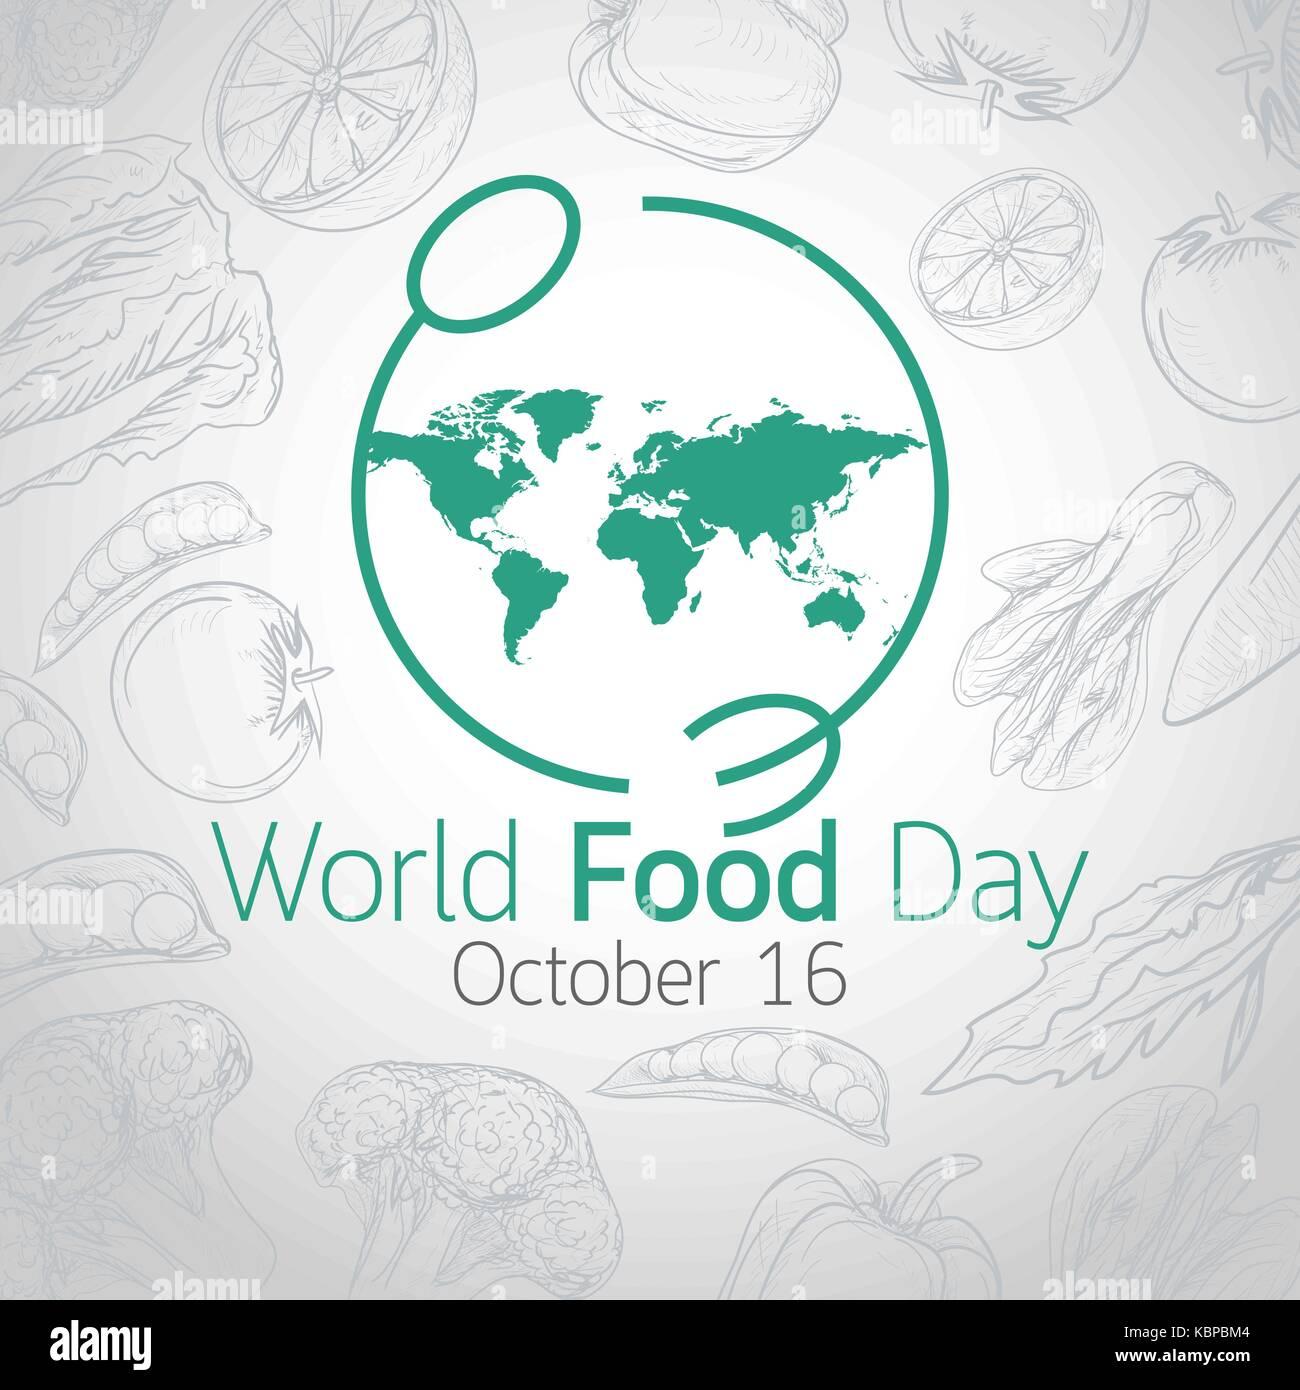 World Food Day vector icon illustration - Stock Image